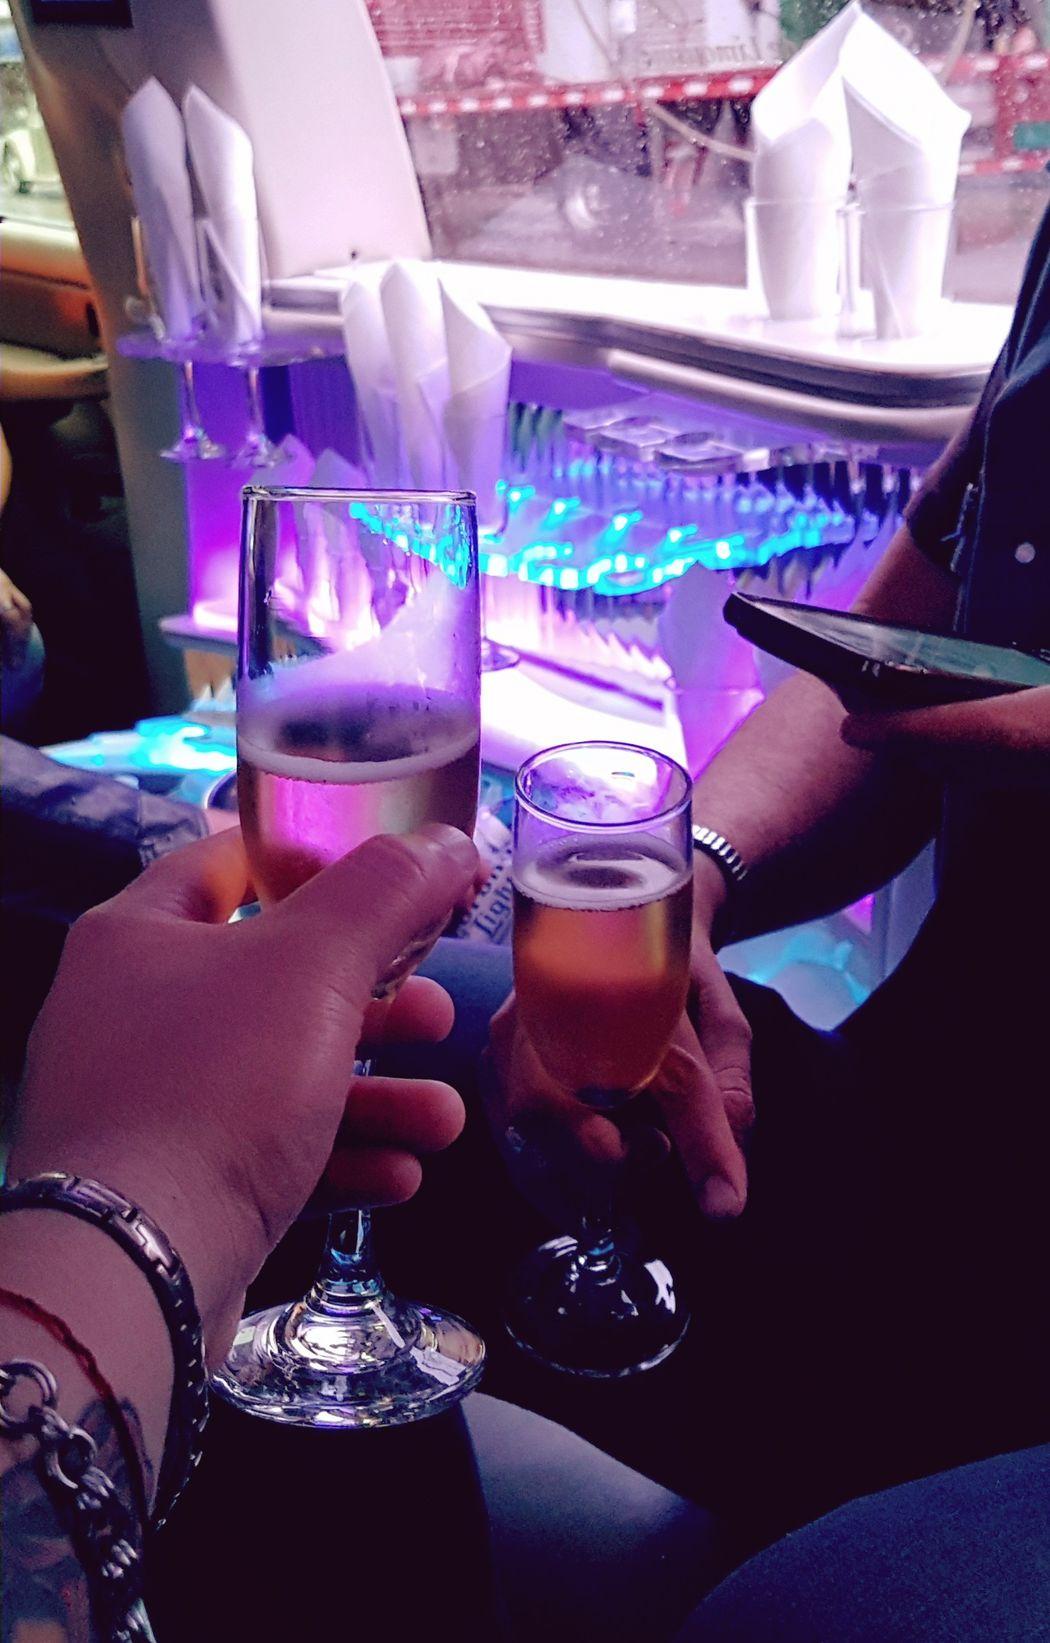 Cheers Cheers 🍻 Glass Wineglass Wineglasses Limousine Limo Rockstar Rockstars Rockstars Around The City Birthday Mexico People Enjoying Life Enjoyment Joy Fiesta Fiesta Limosina Copas Colors Colour Of Life